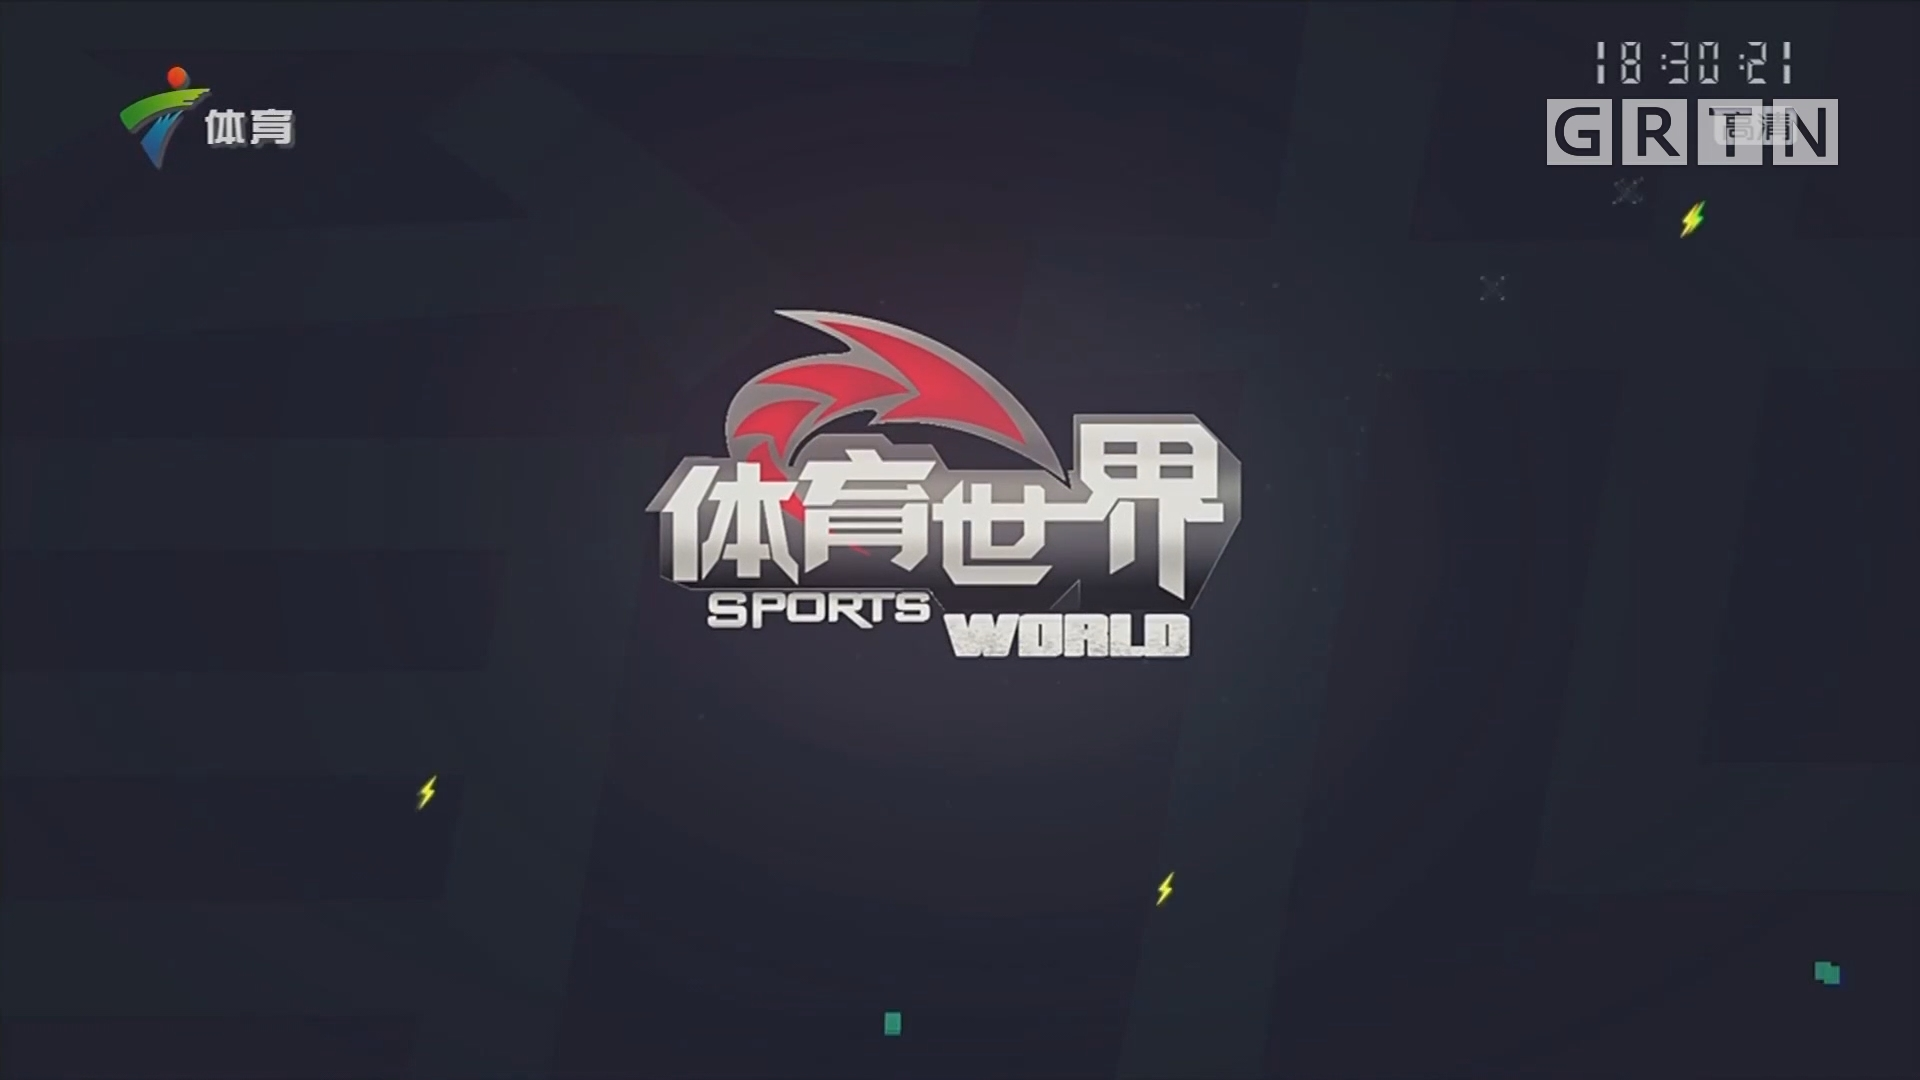 [HD][2018-12-10]体育世界:羽联总决赛抽签出炉 石宇奇避开桃田贤斗